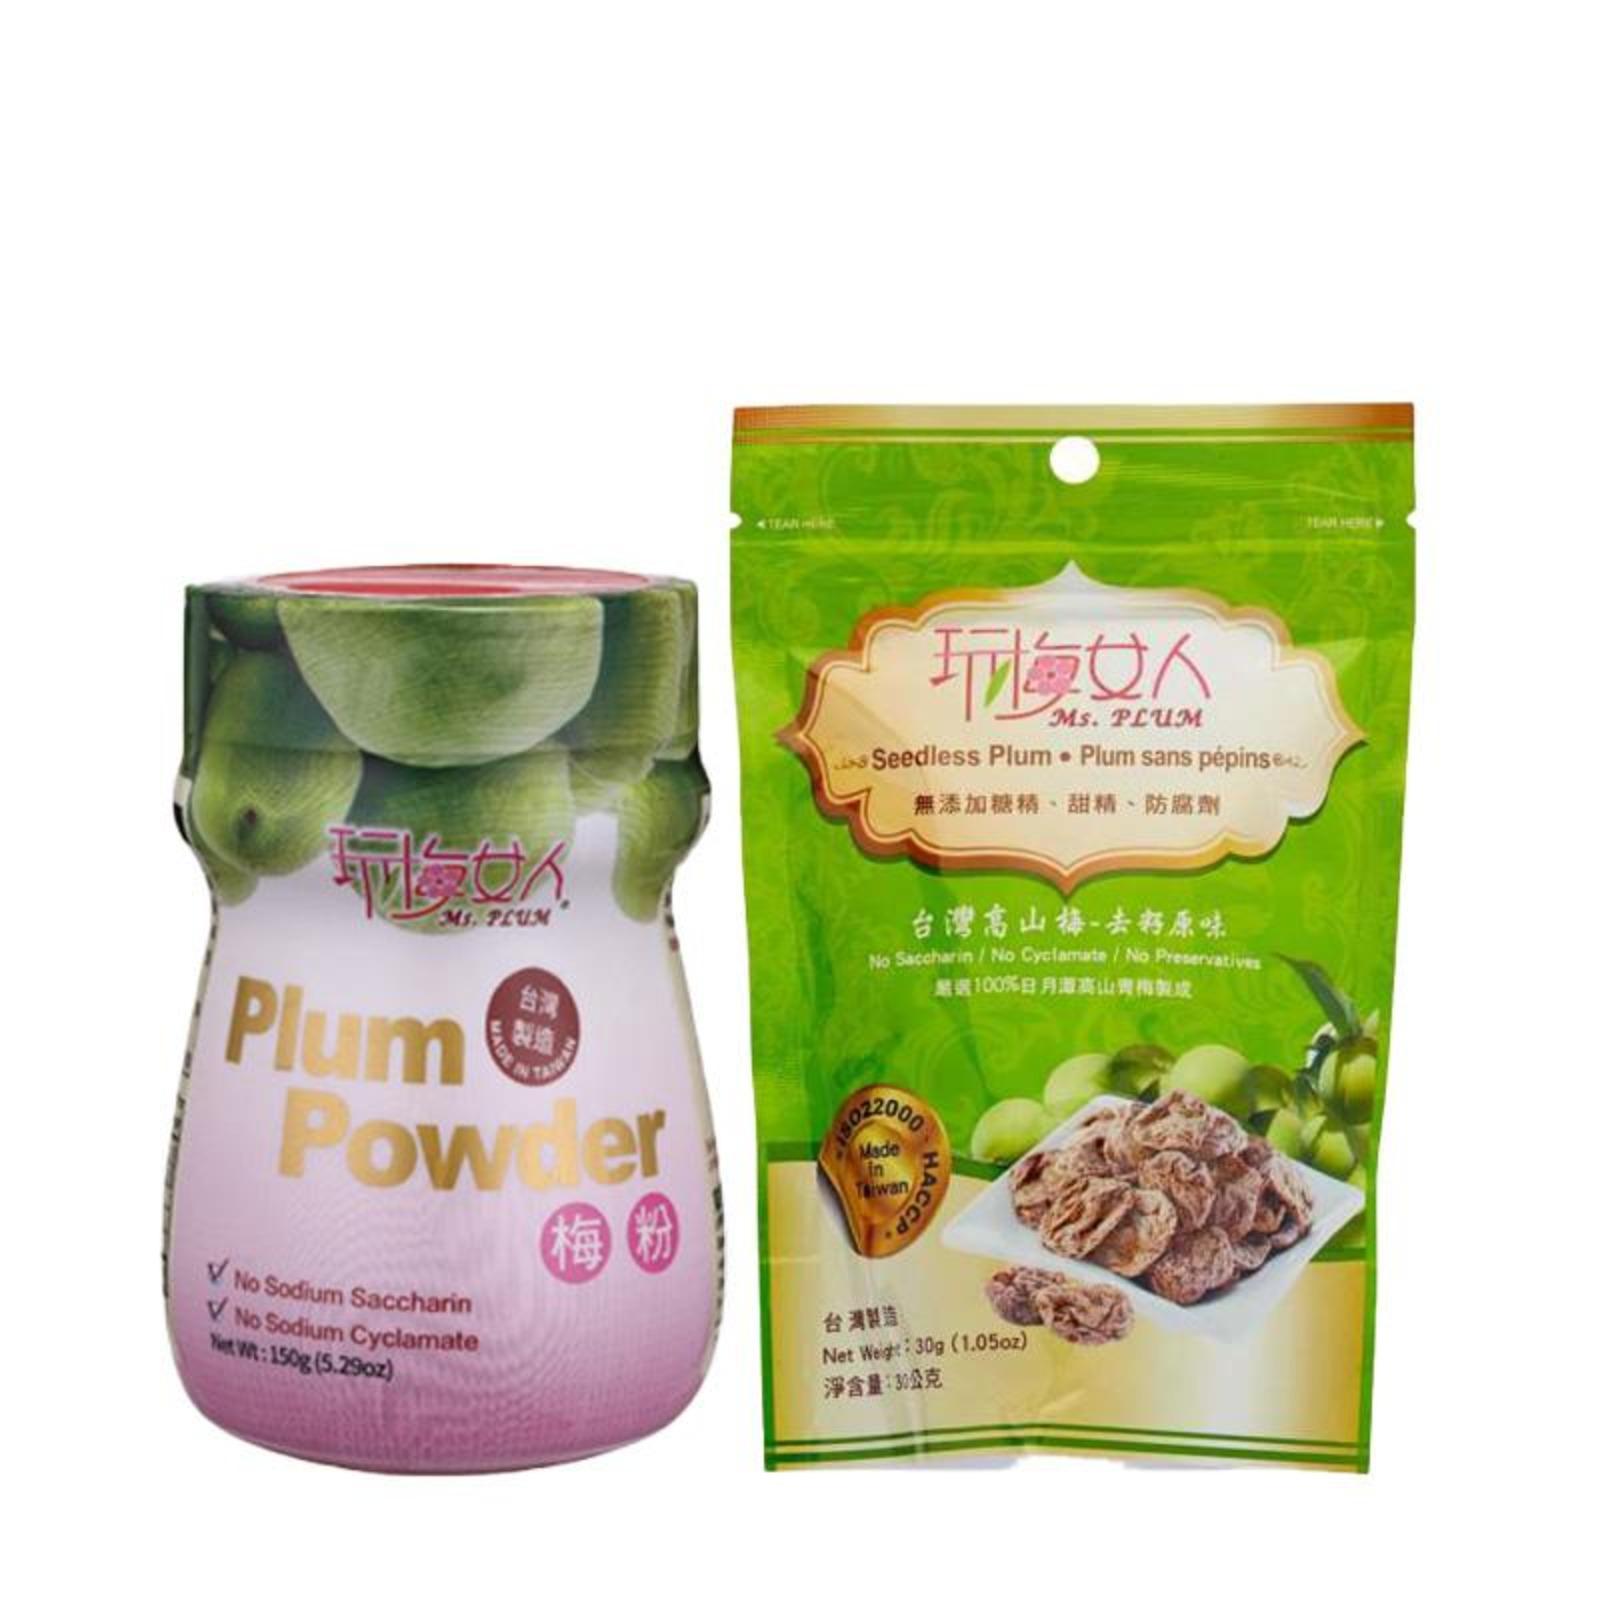 Ms Plum  Plum Powder and Seedless Plum